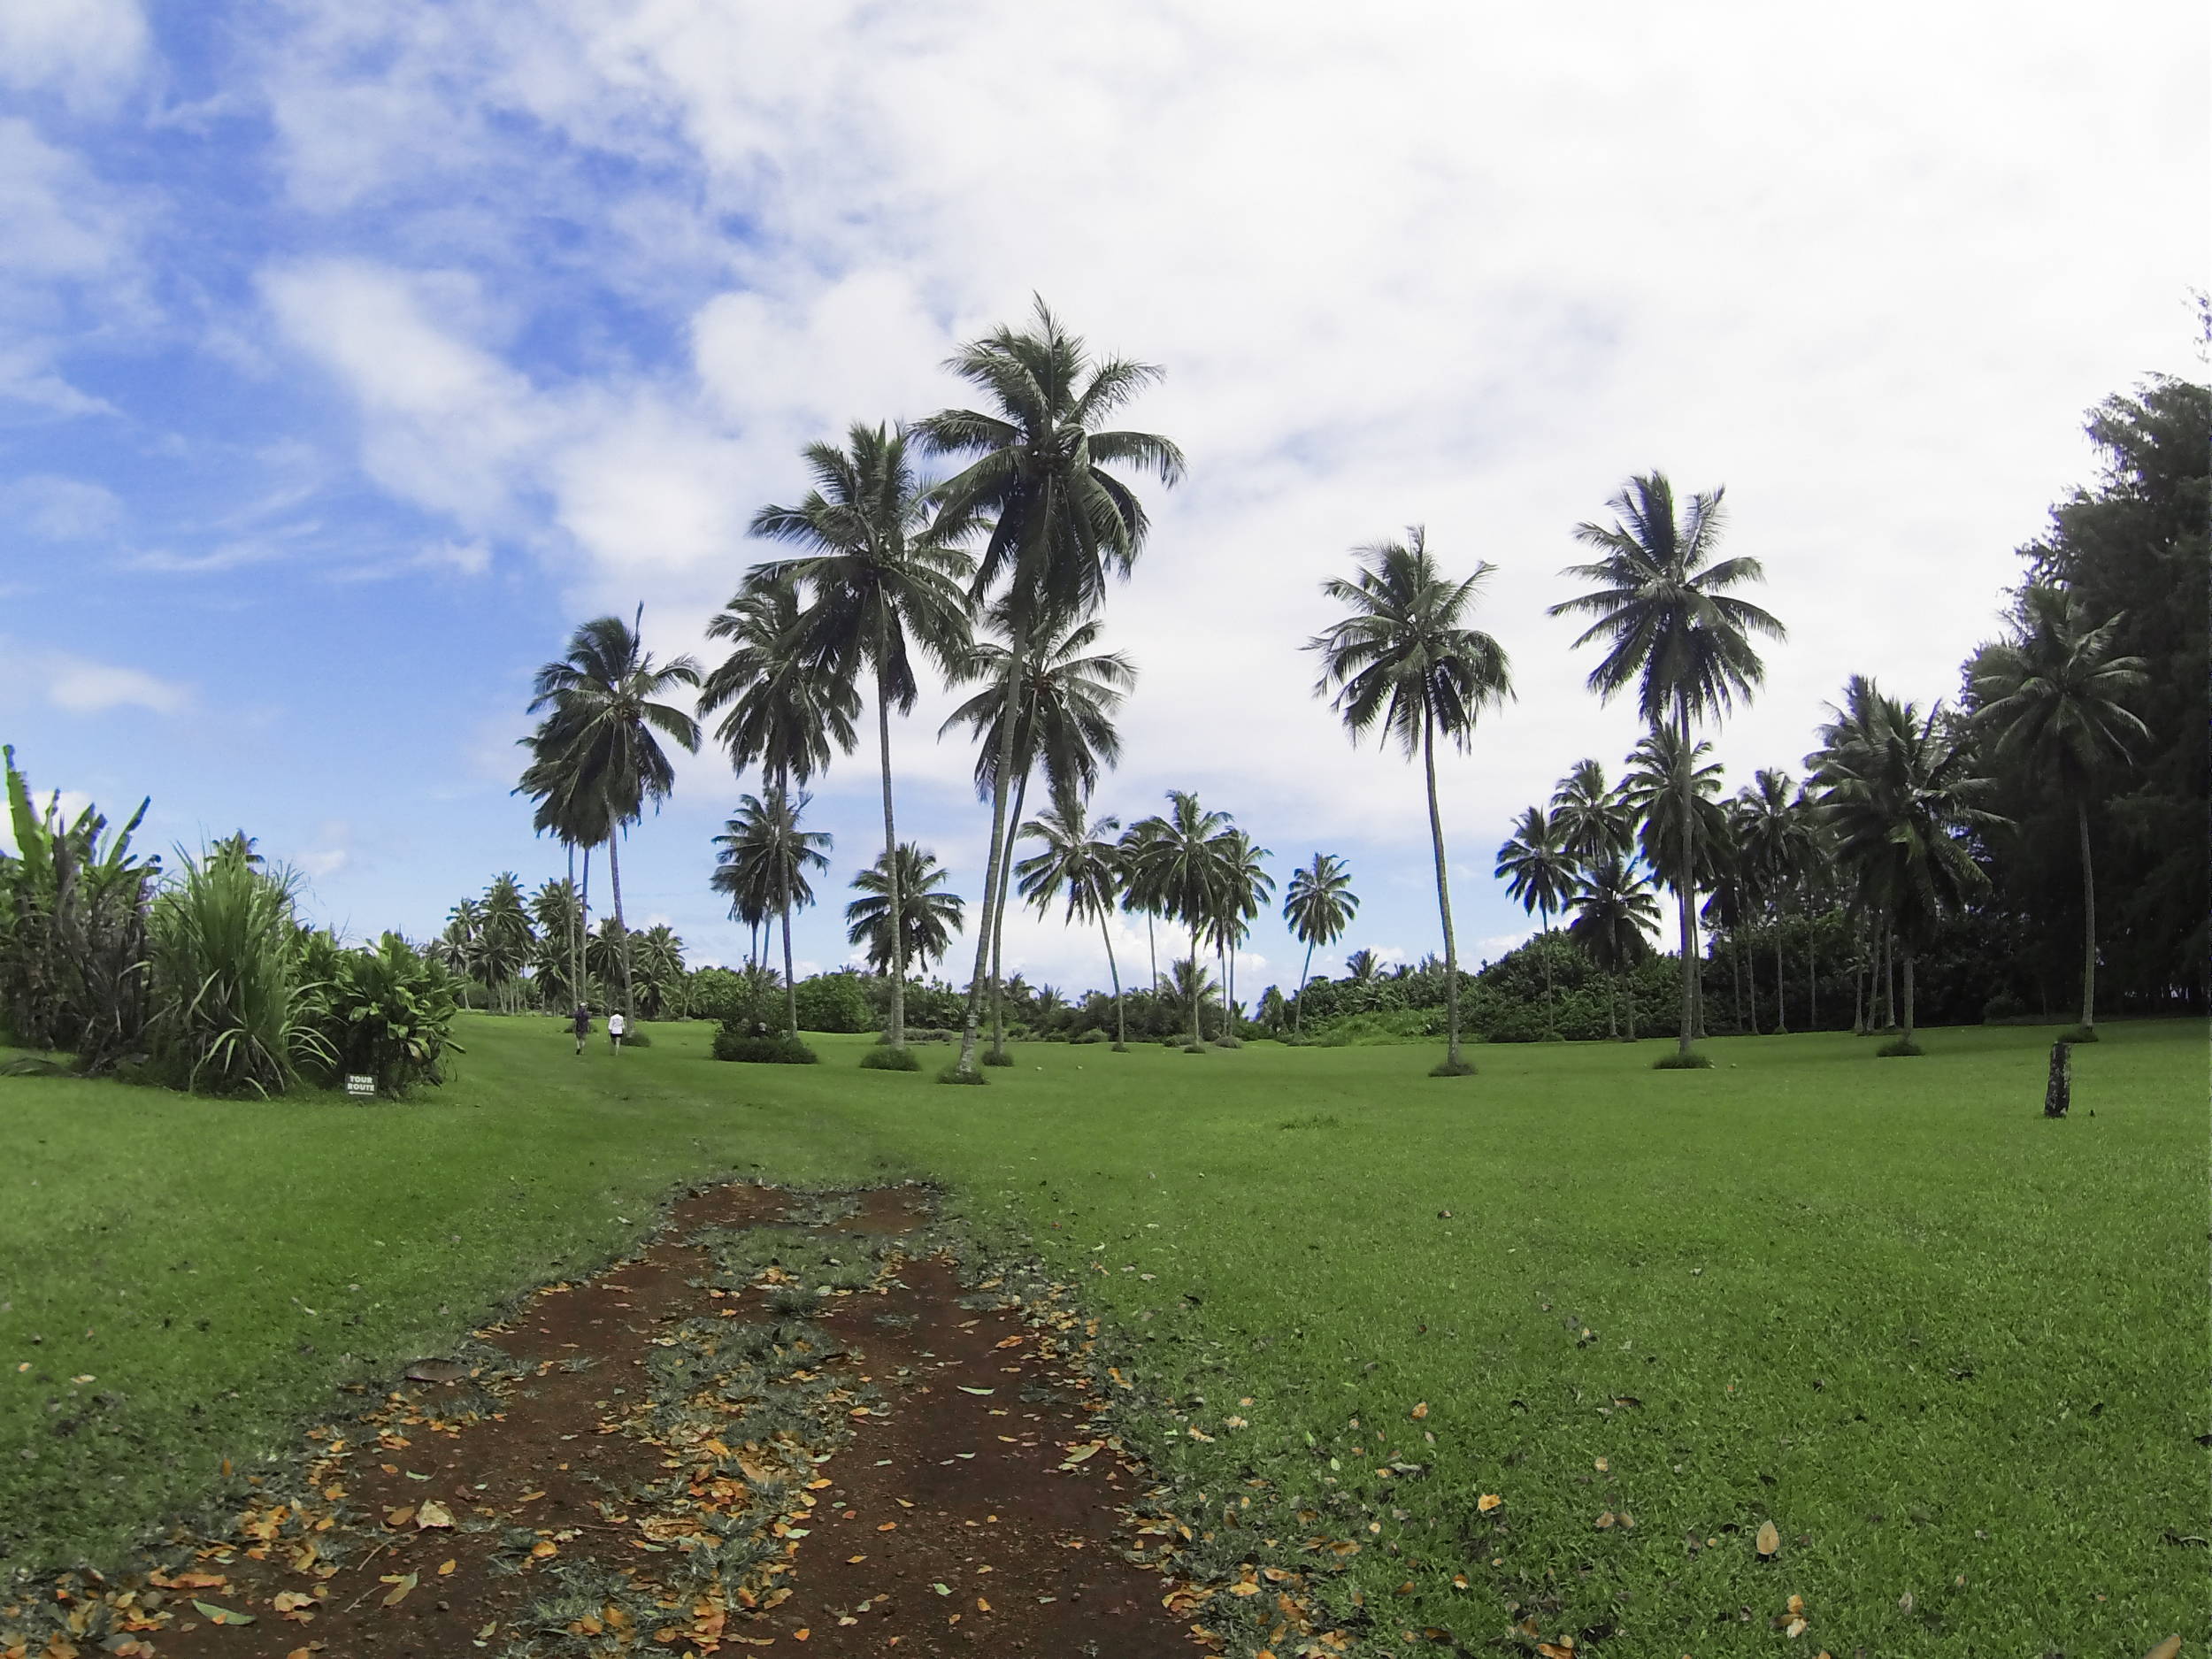 Kahanu national botanical gardens hosts some incredible native hawaiian flora, including the deadly coconut tree.